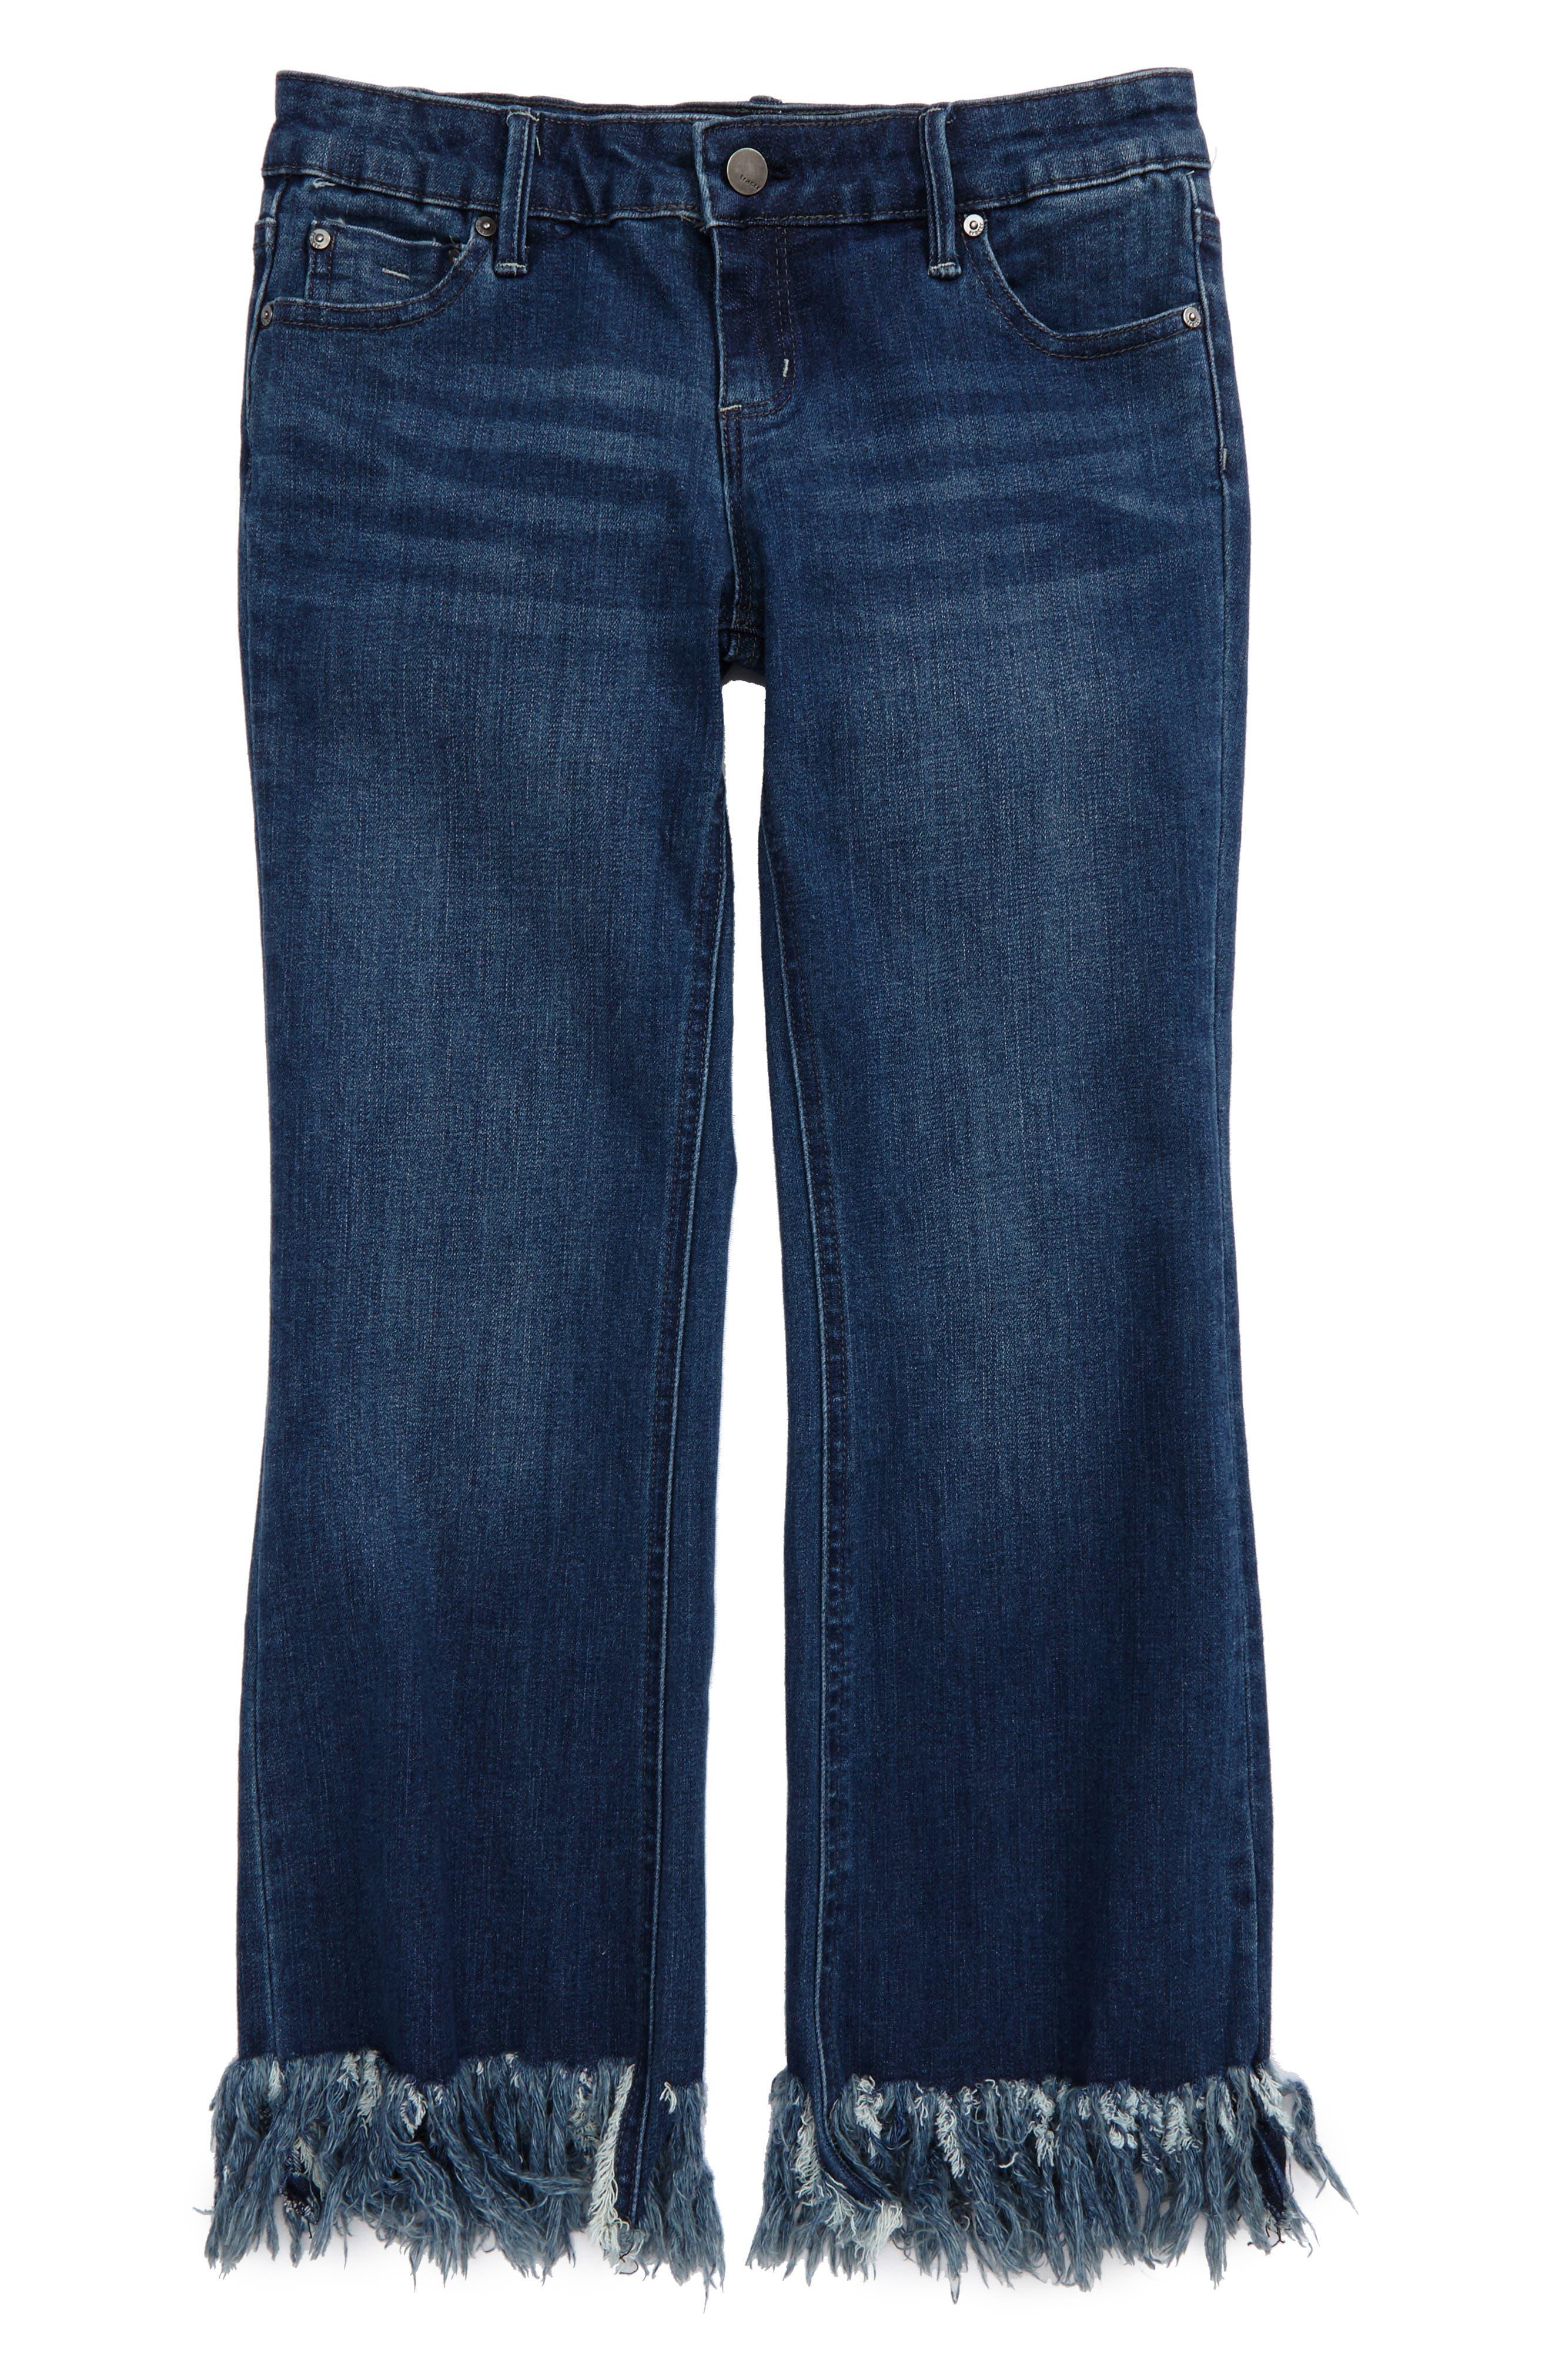 Tractr Frayed Hem Crop Jeans (Big Girls)